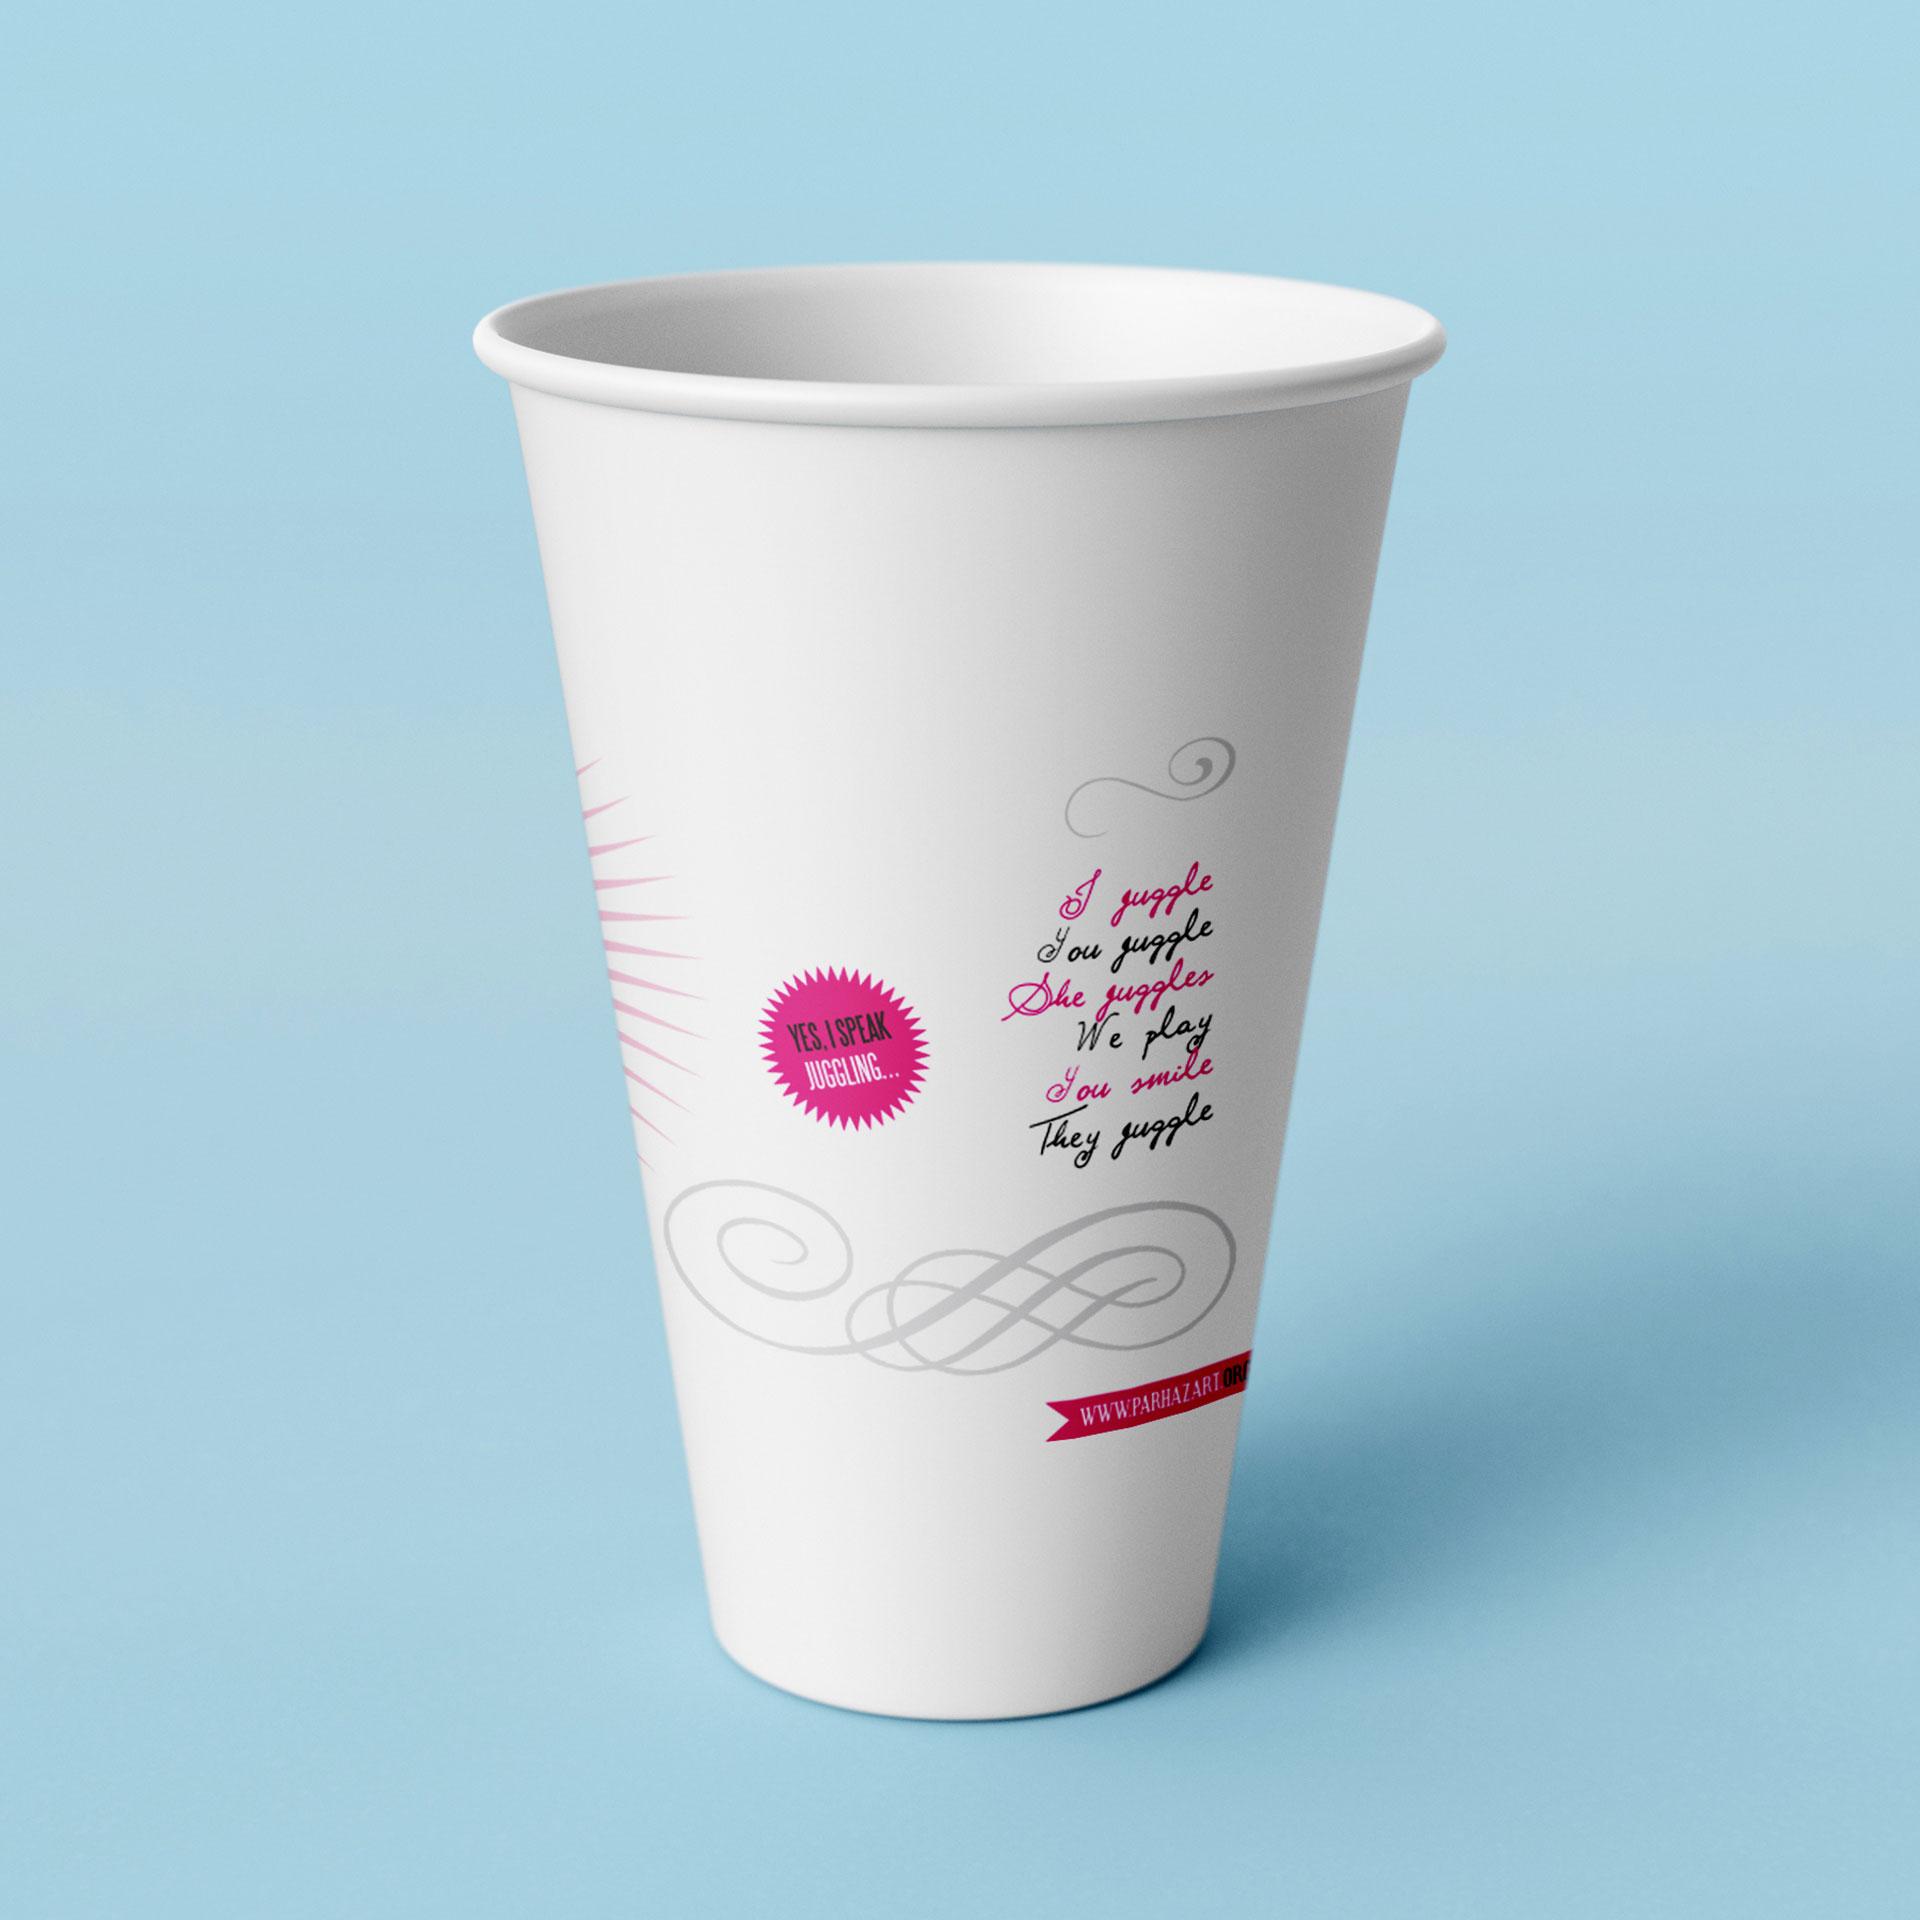 Ecolo cup EJC2013-Cmondada Design